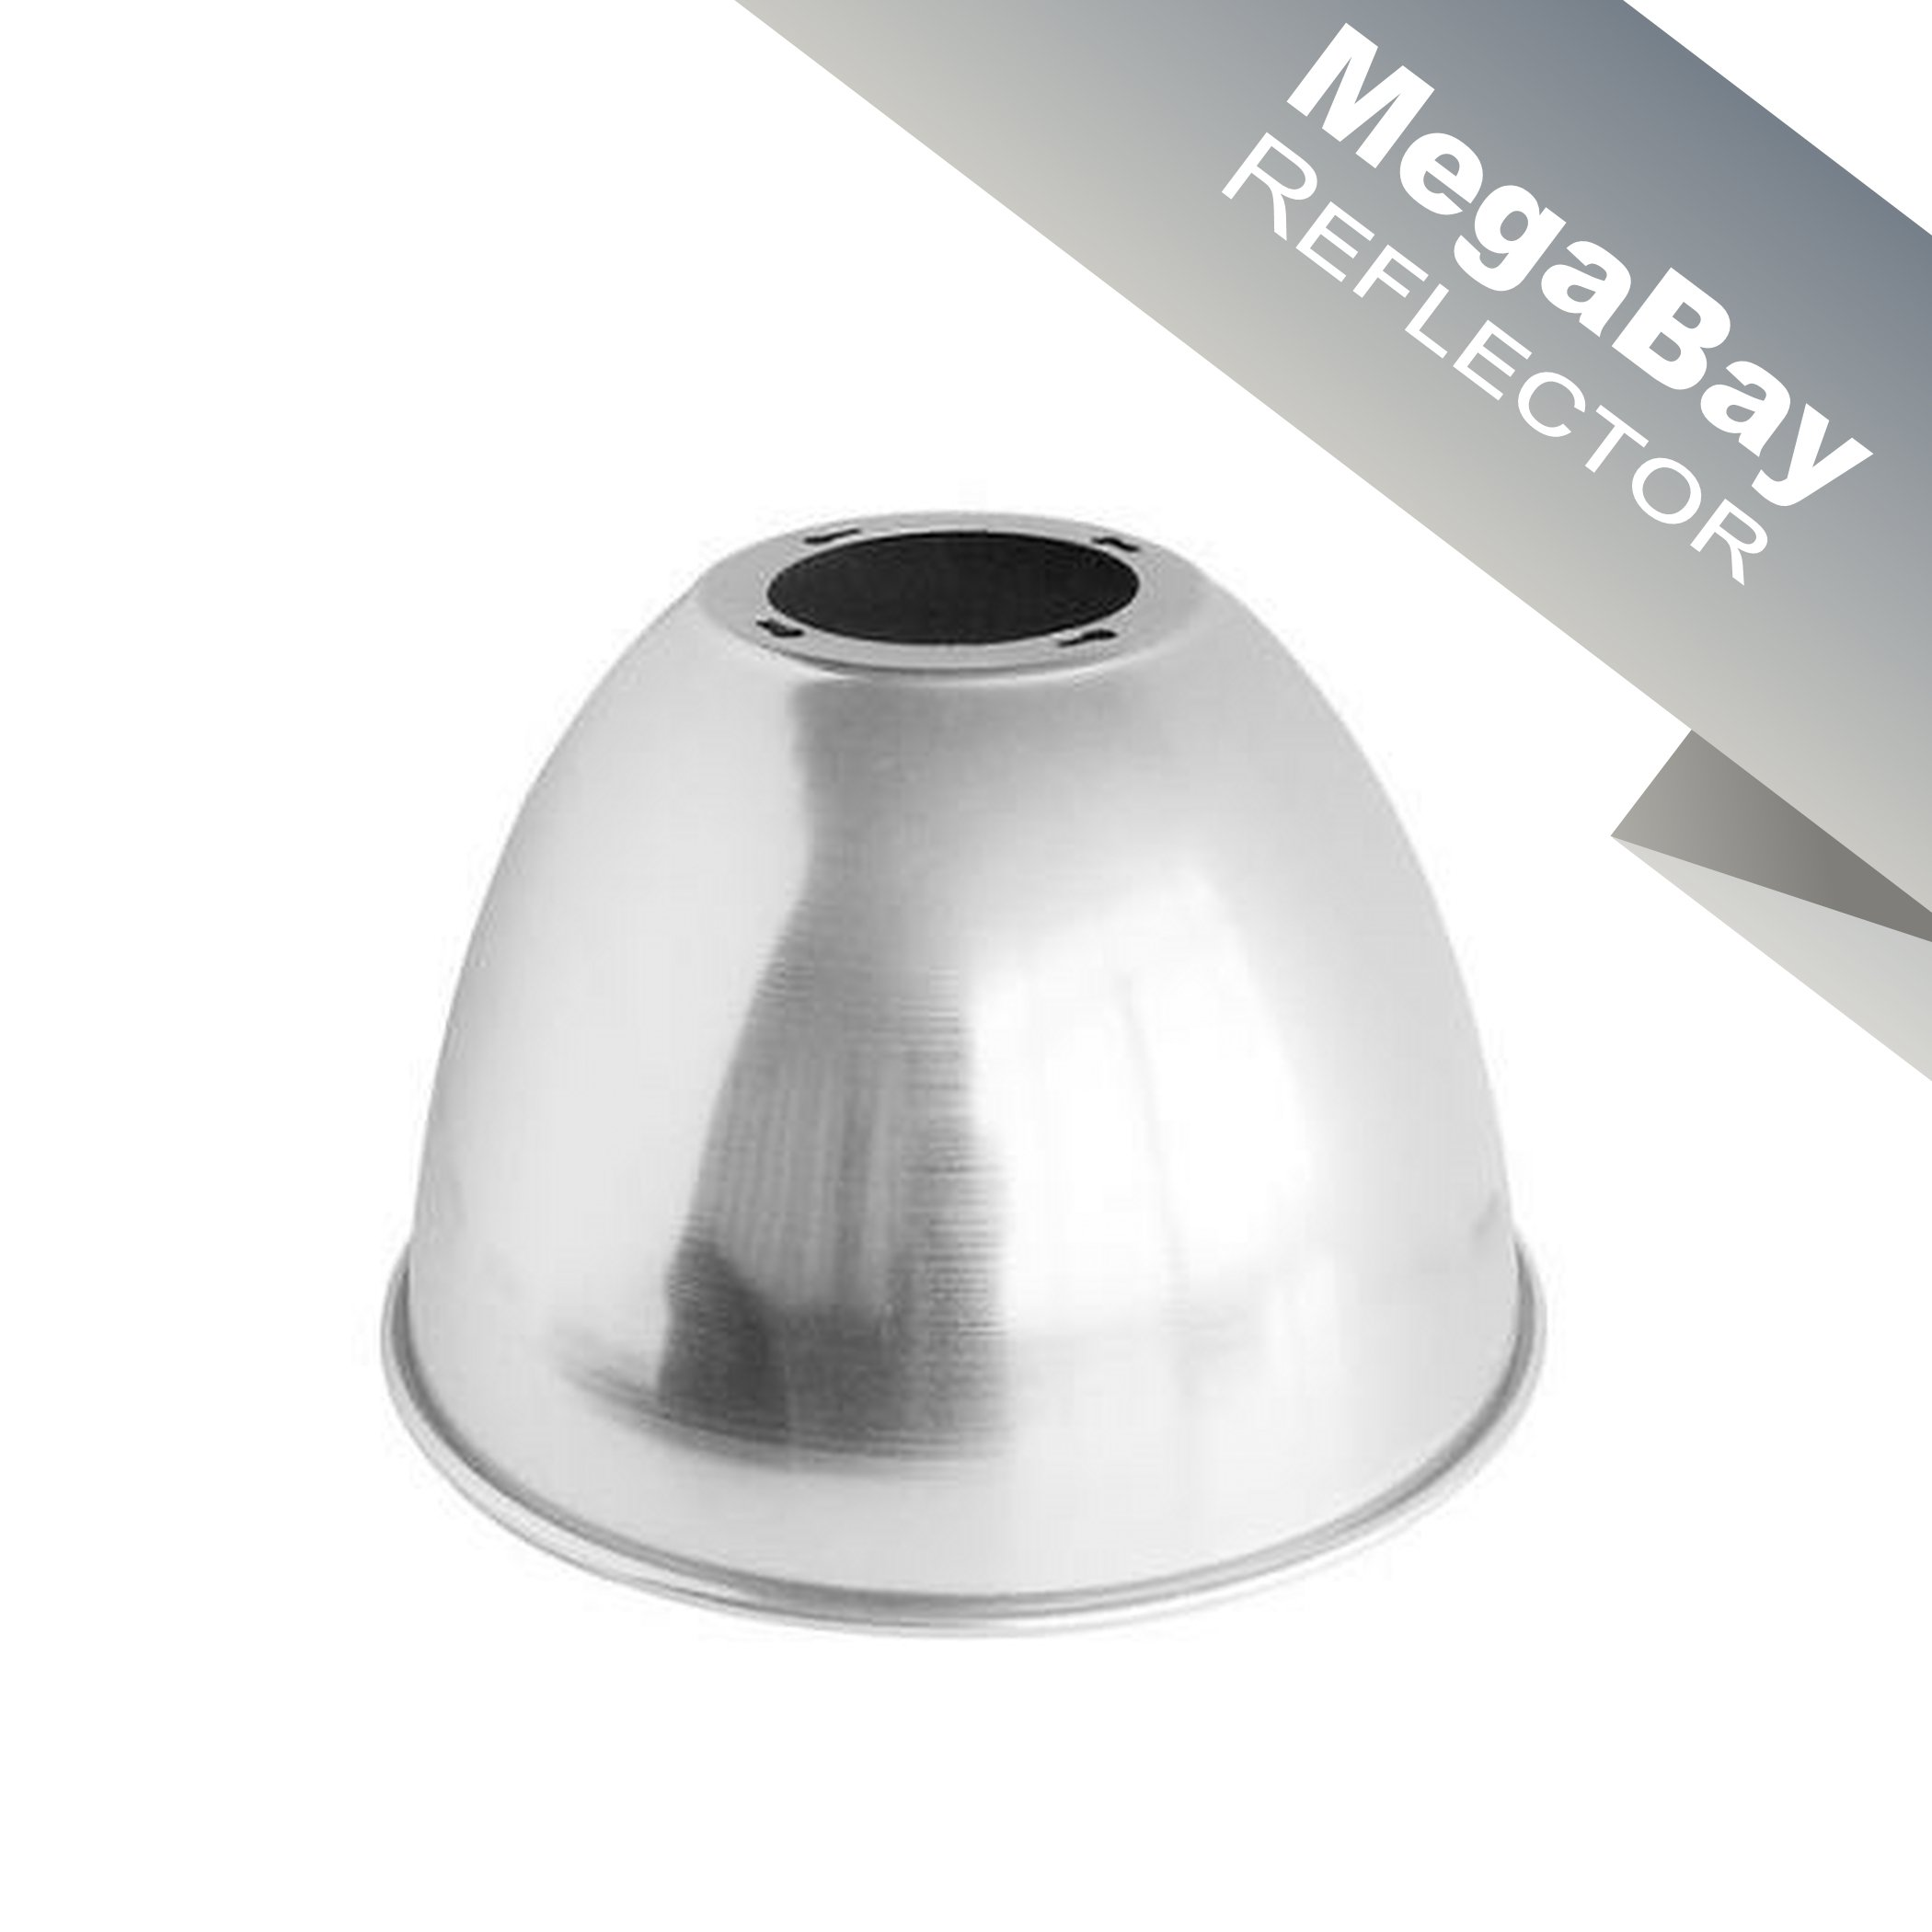 Enpower Megabay Aluminum, High Shine, LED High Bay REFLECTOR (Silver)